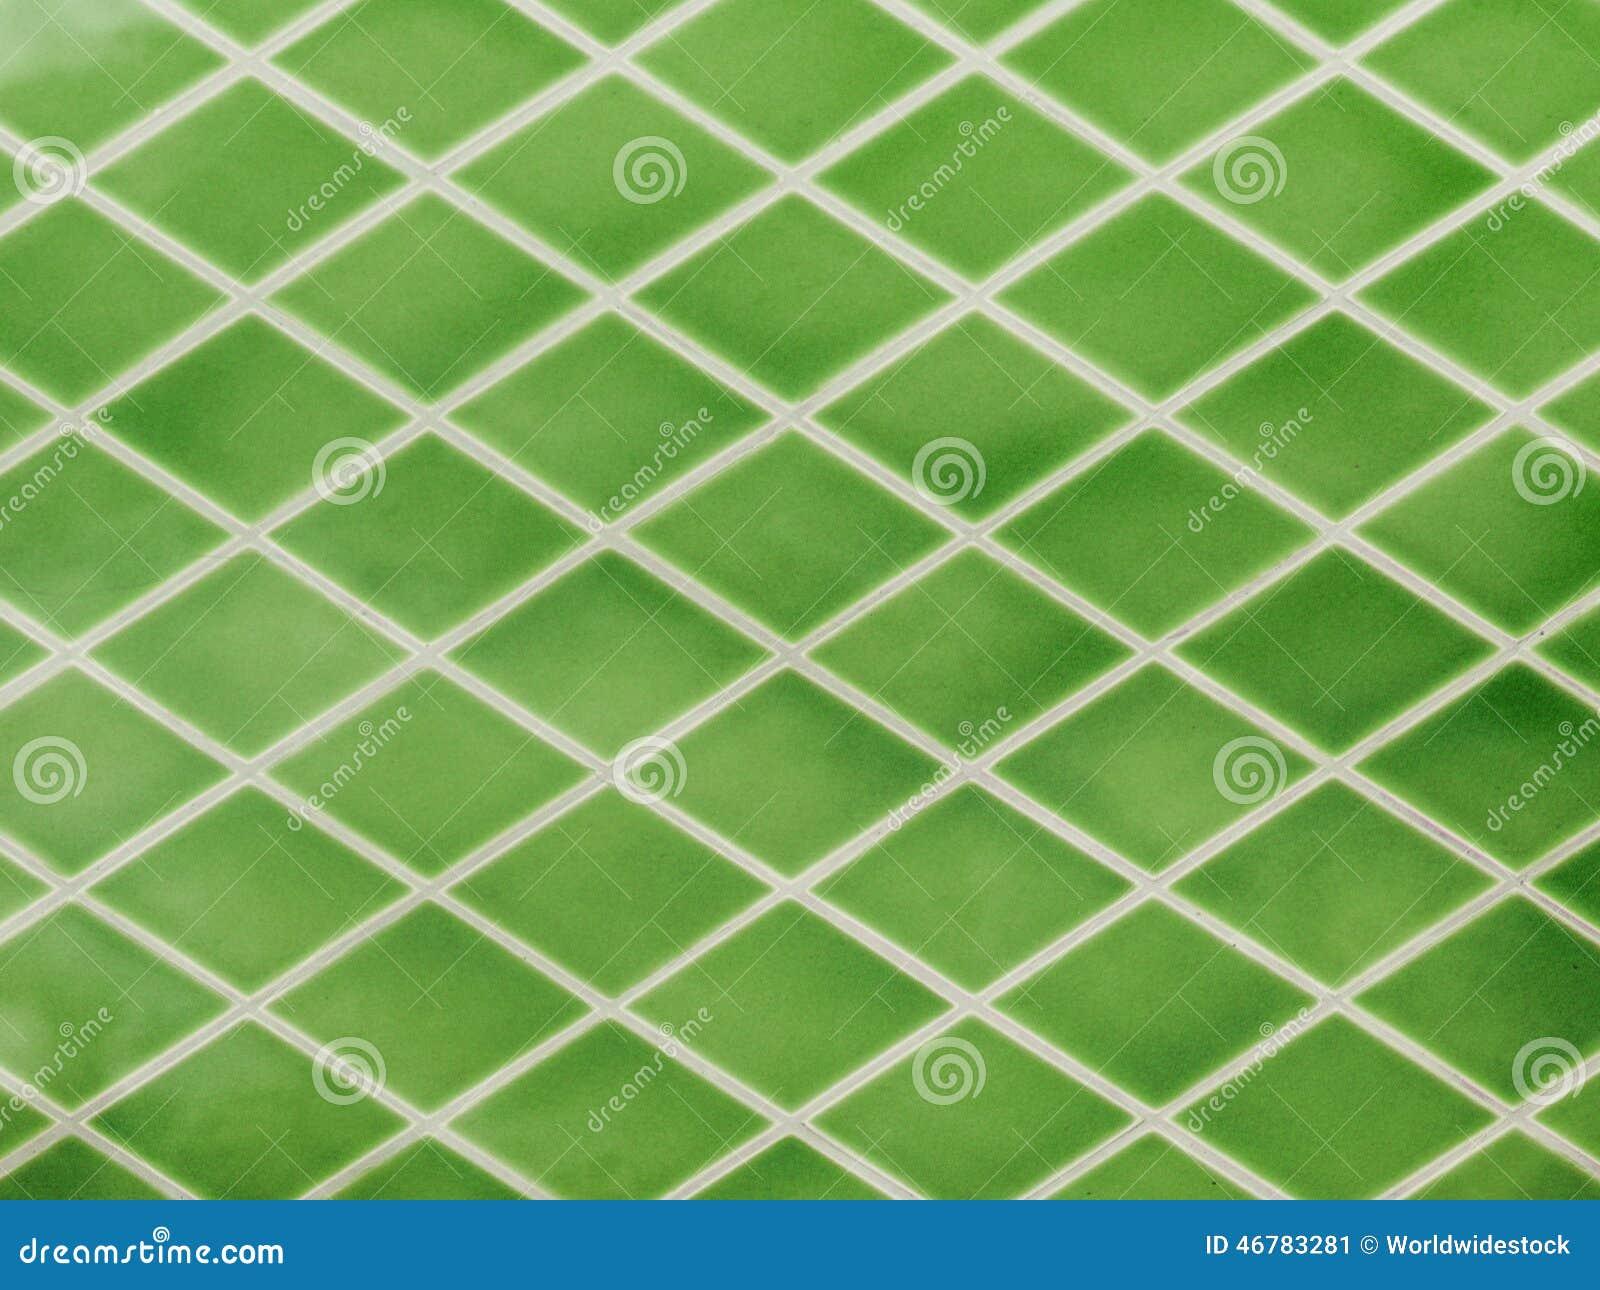 Piastrelle di ceramica verdi illustrazione di stock - Piastrelle verdi ...